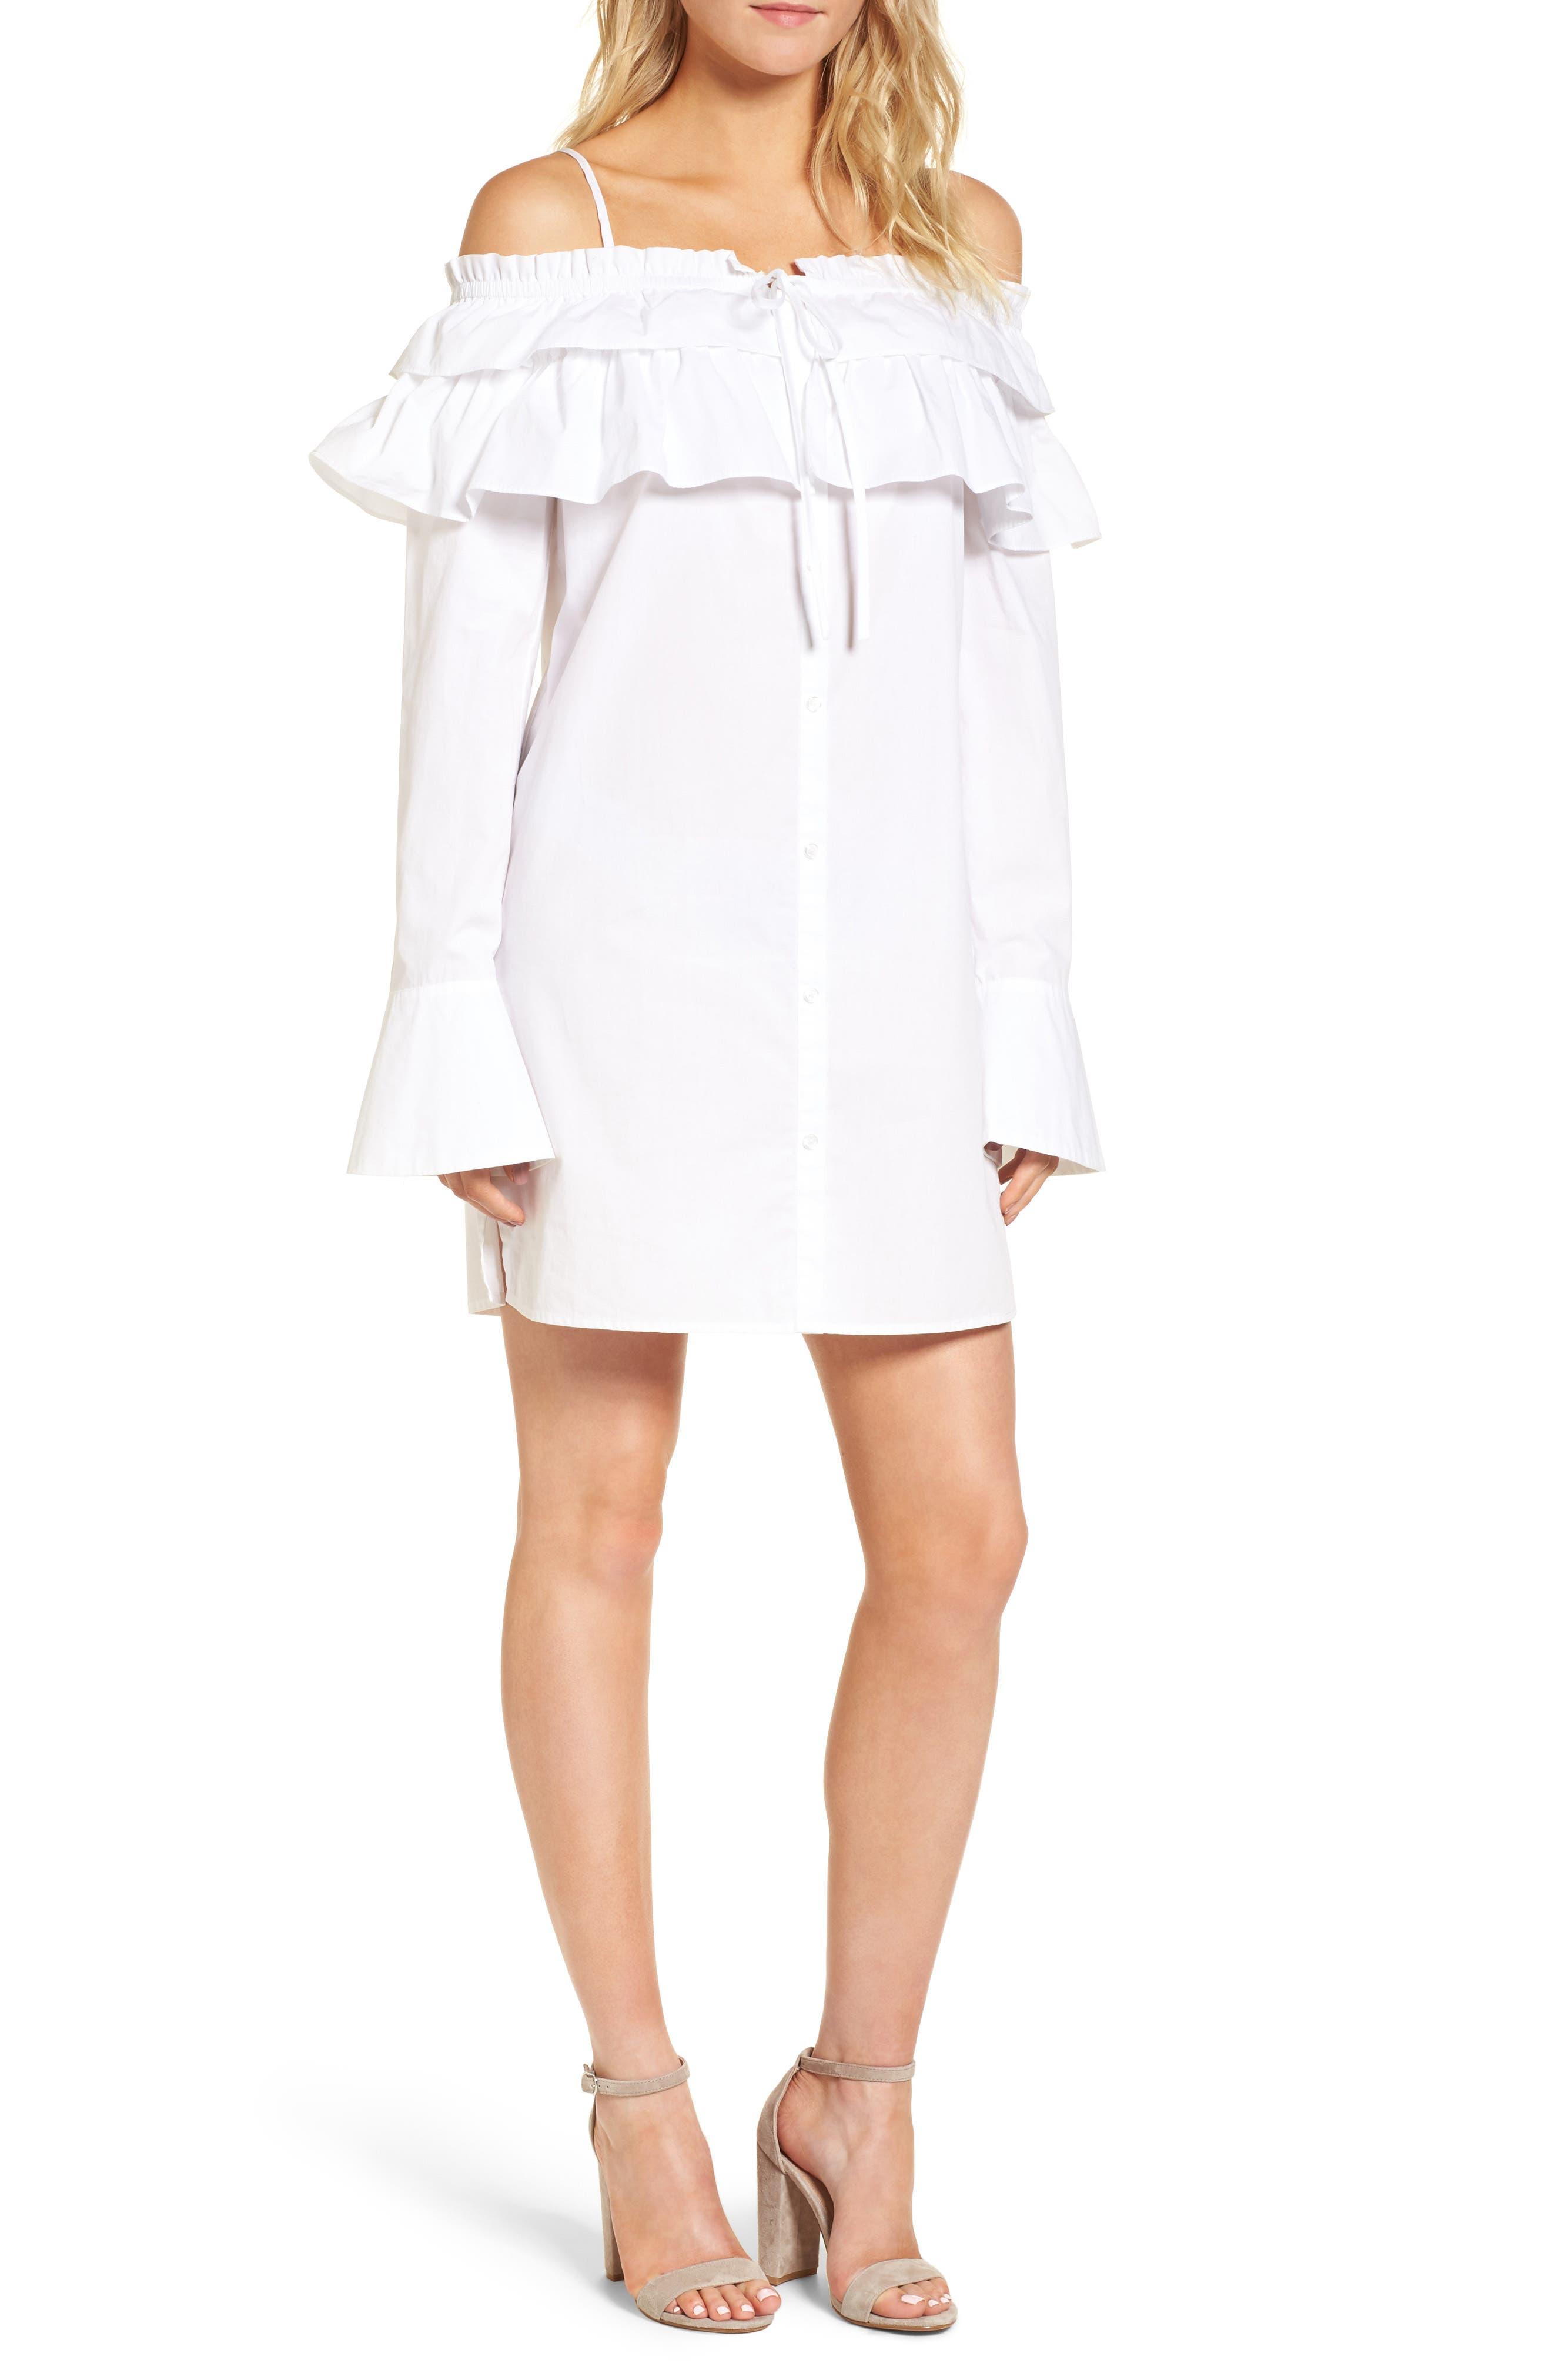 Rebecca Minkoff Pallas Off the Shoulder Dress